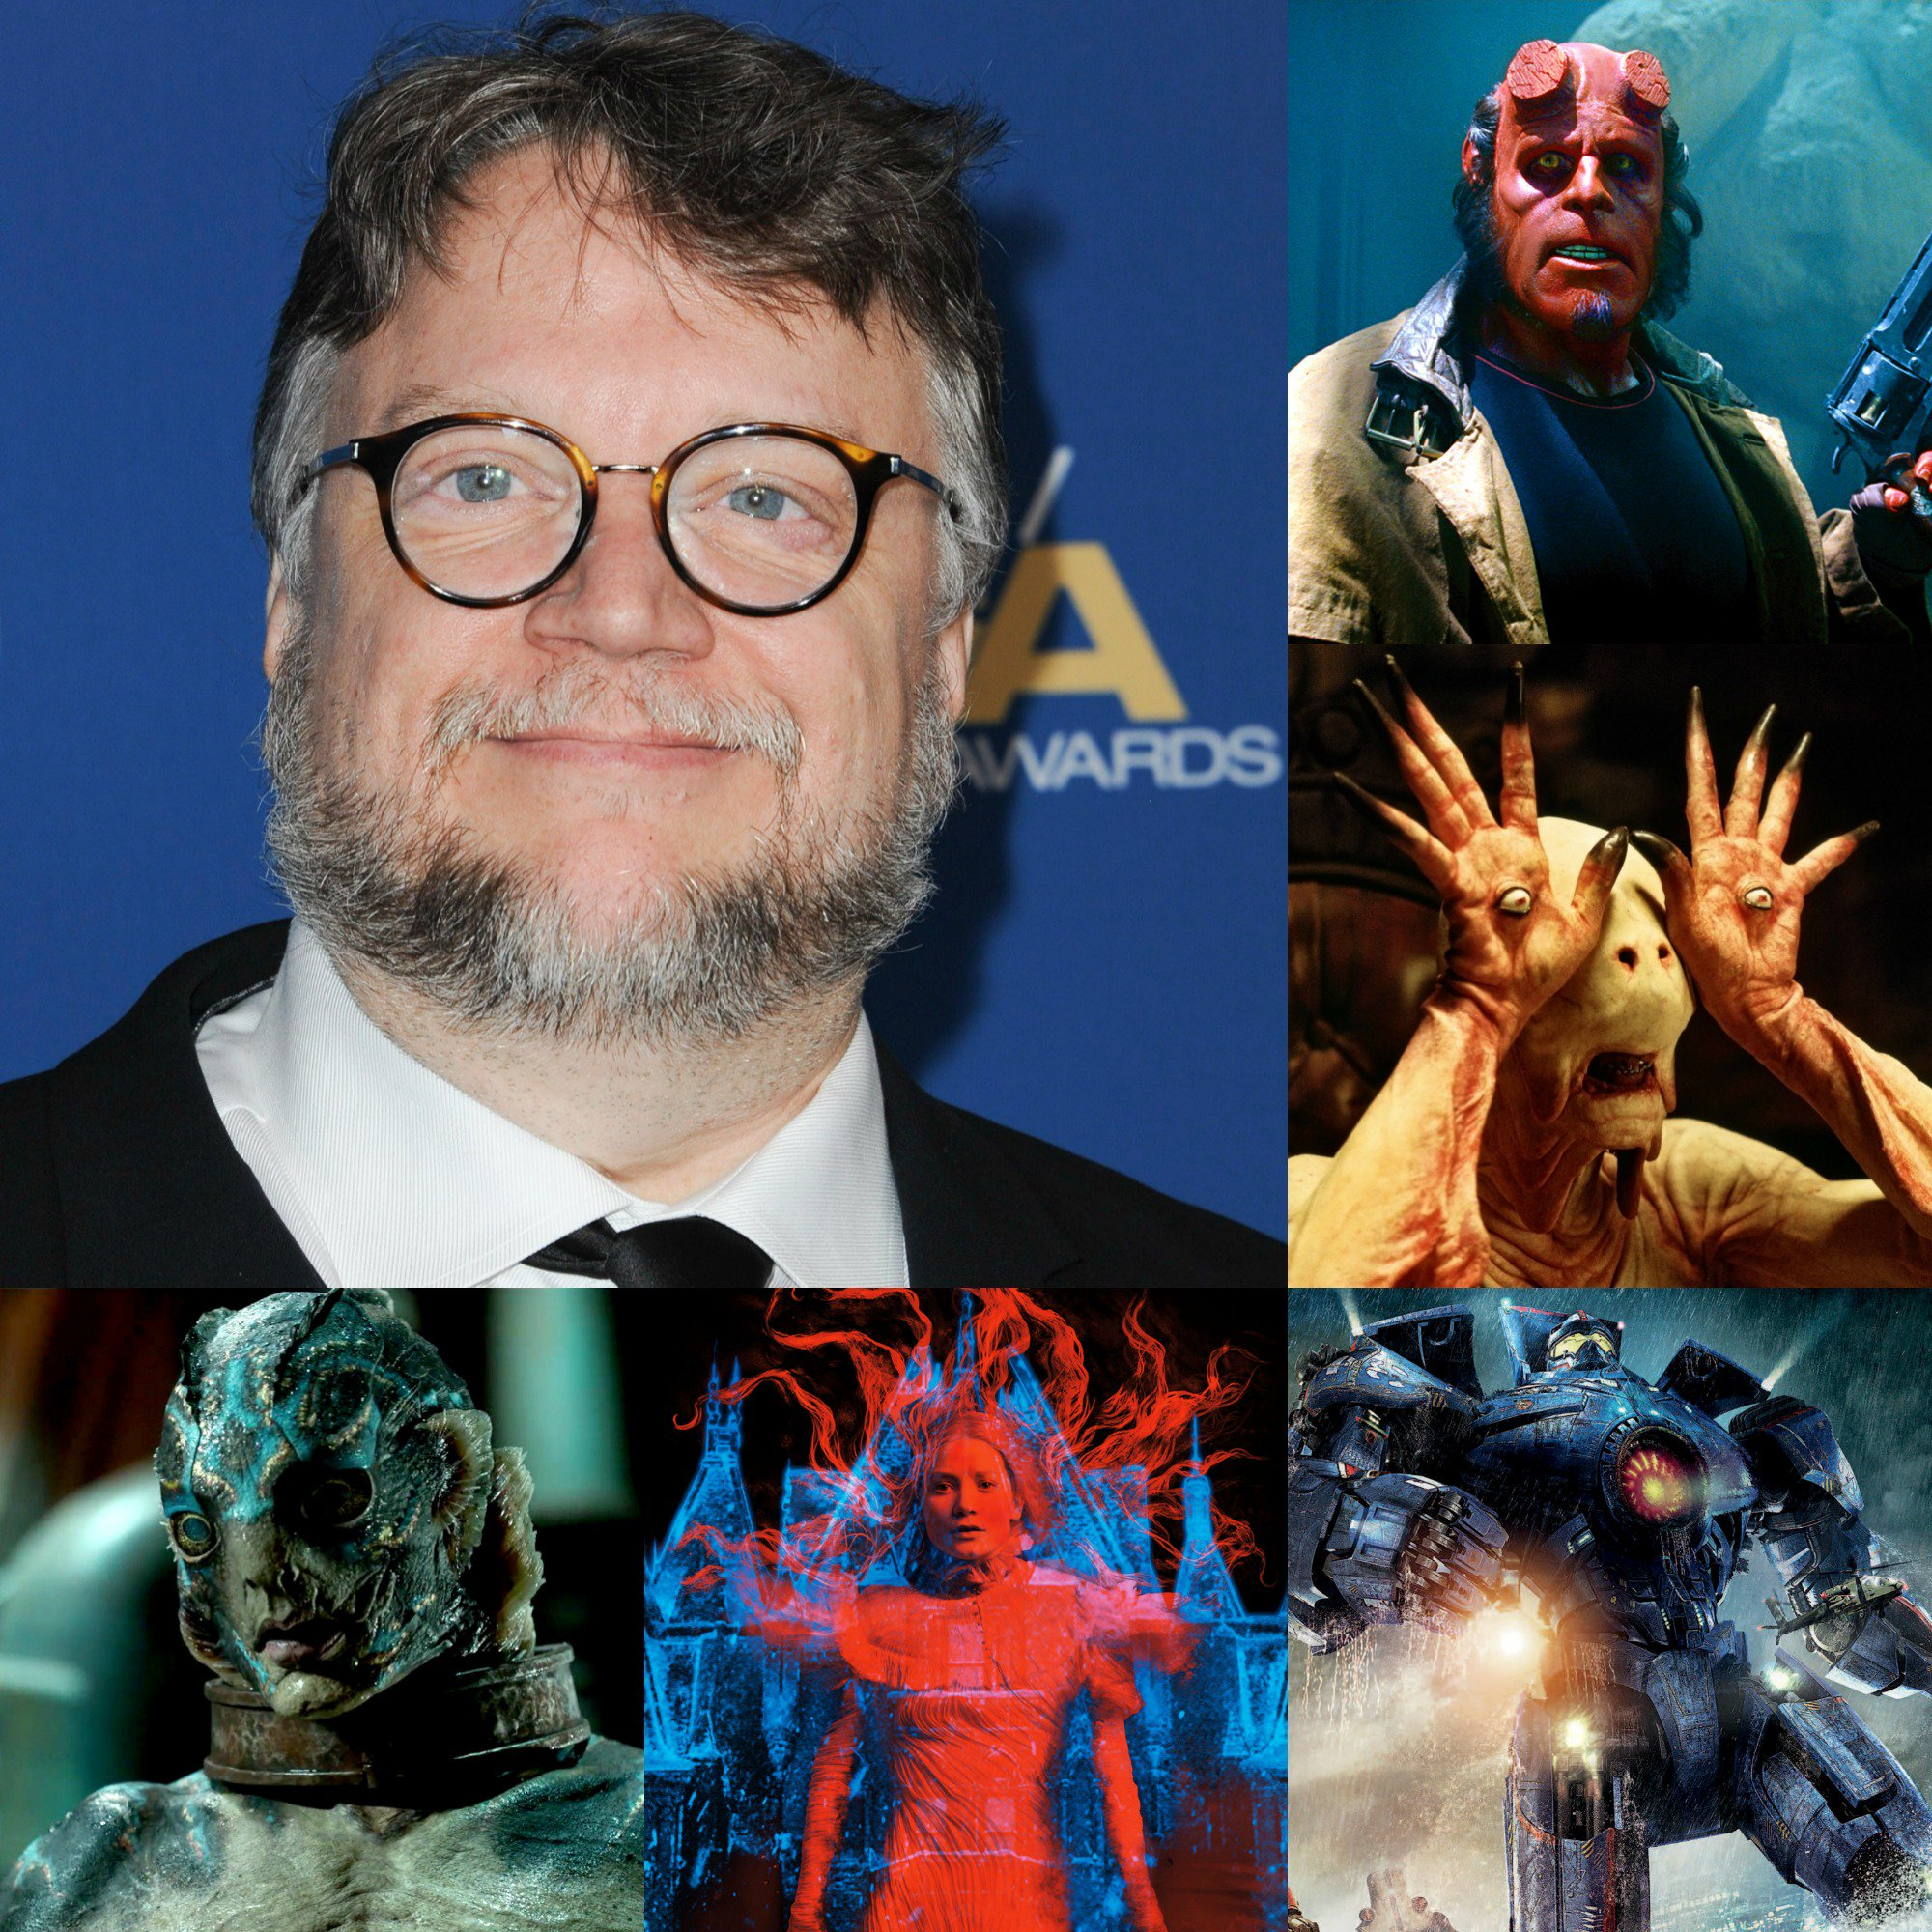 Happy birthday to Academy Award-winning director Guillermo del Toro!